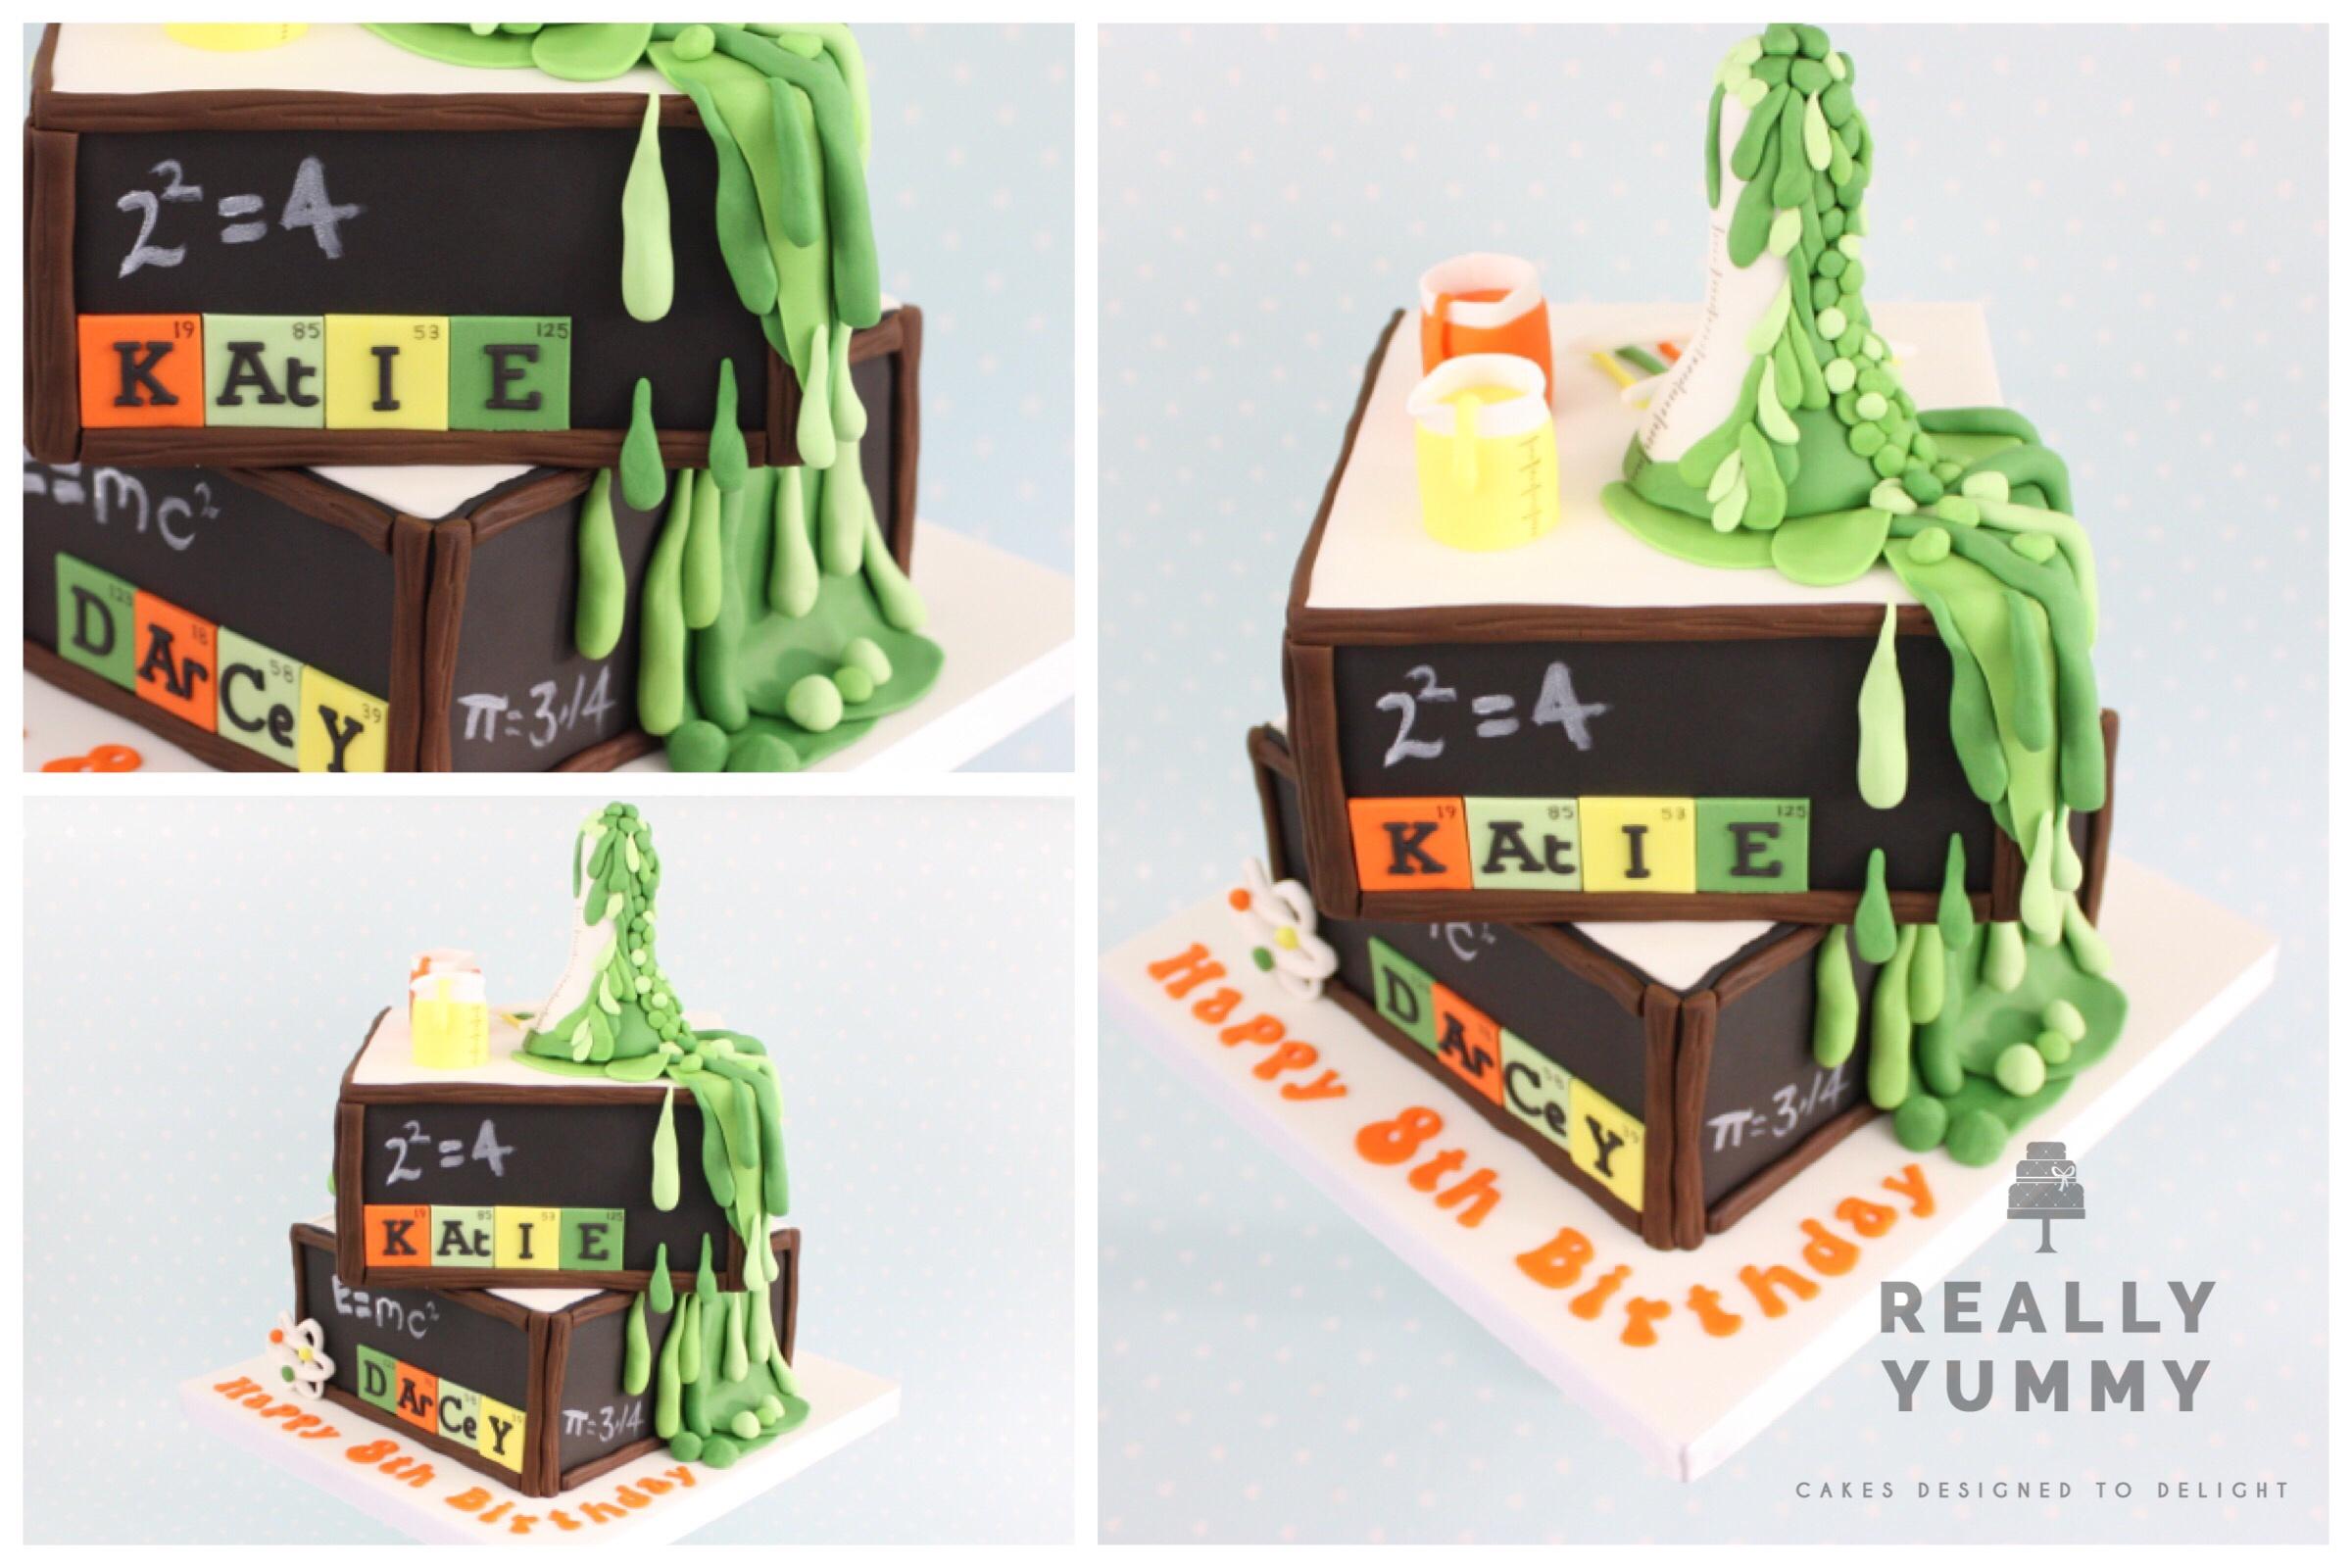 Slimy science cake